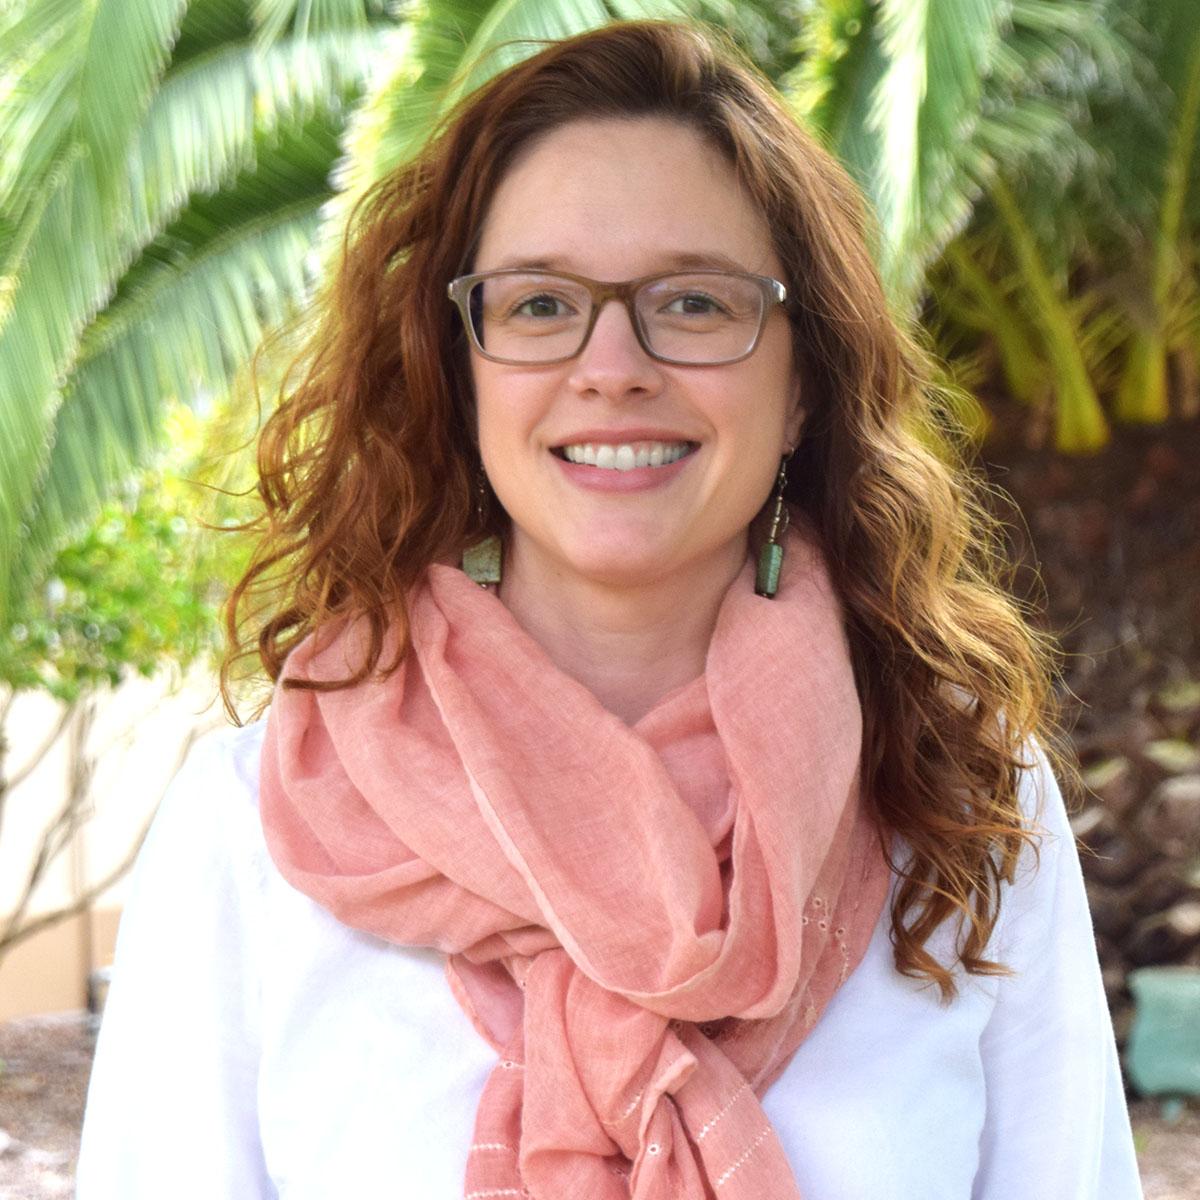 Allison Torres